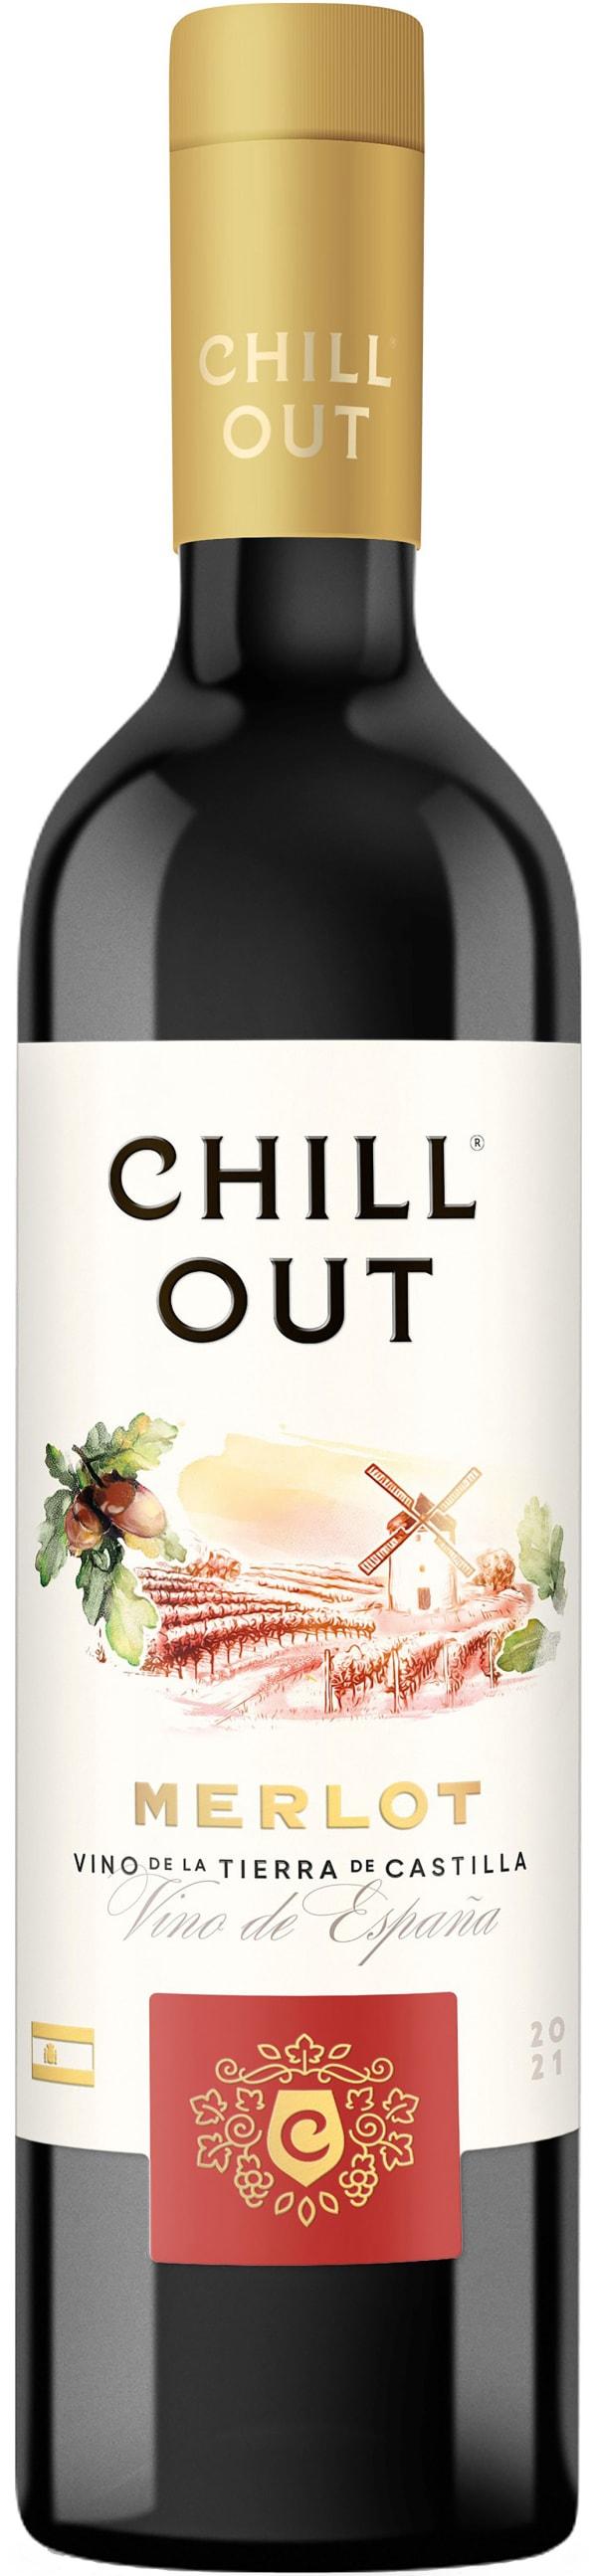 Chill Out Soft & Vibrant Merlot 2015 muovipullo